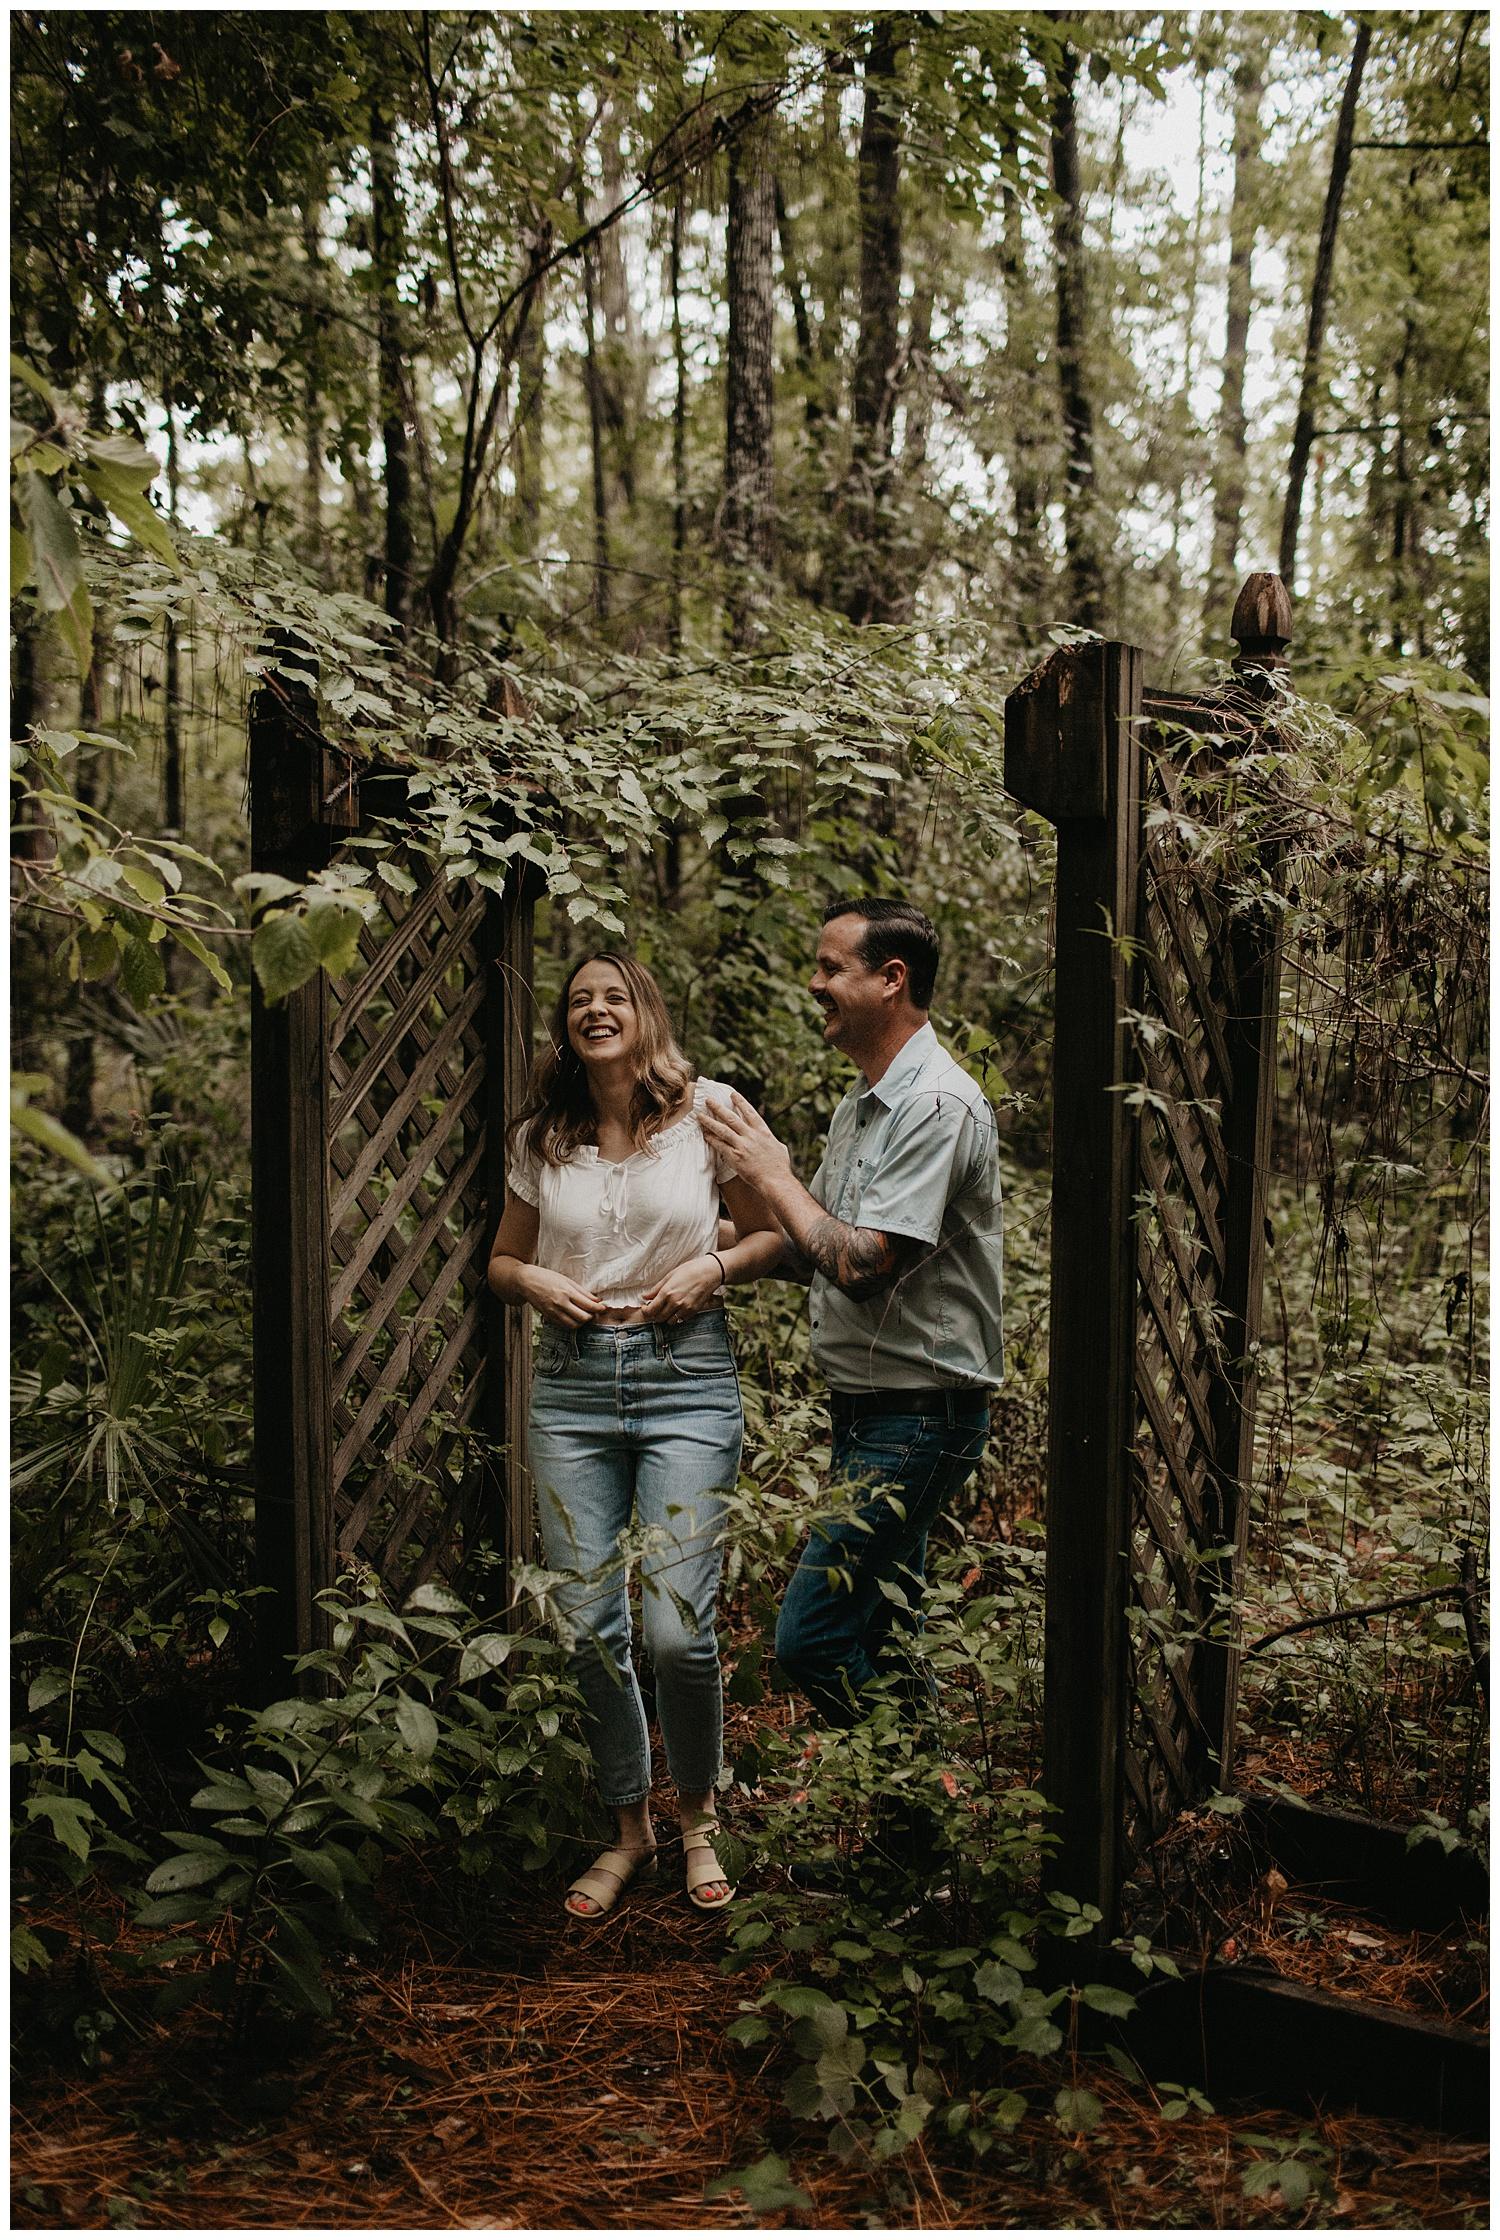 tillie-fowler-park-engagement-jacksonville-florida_0664.jpg